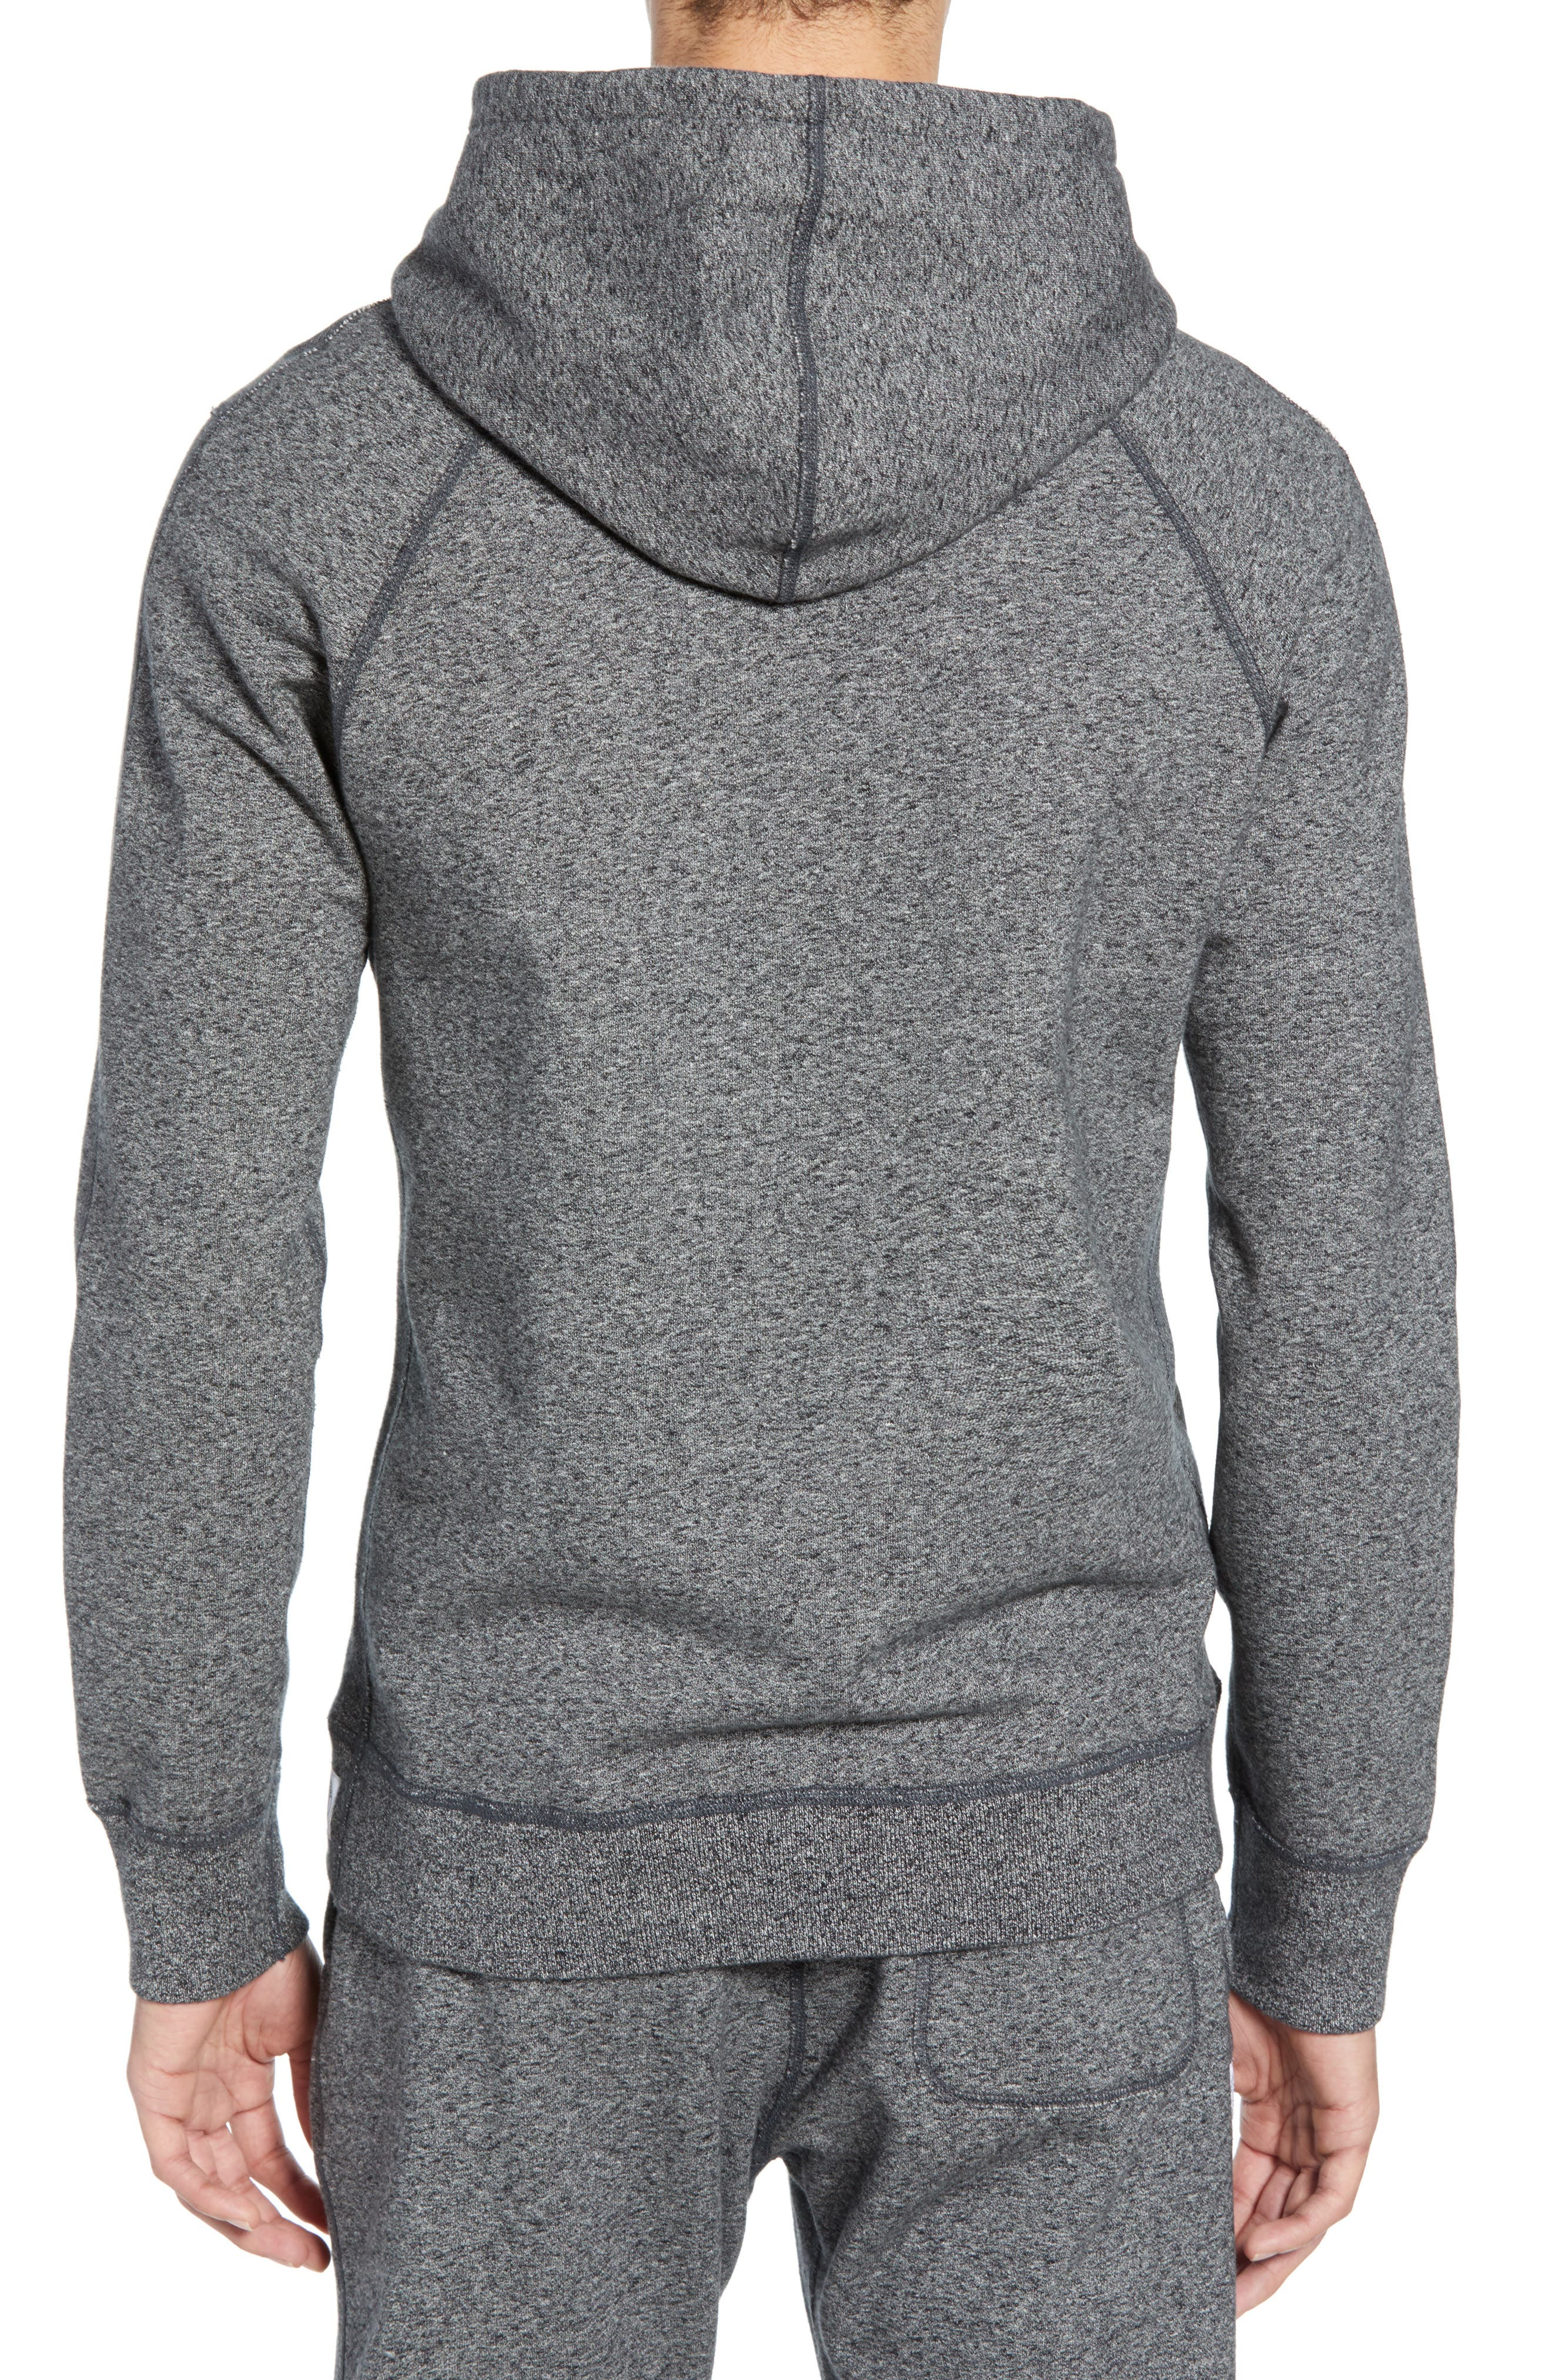 Activewear Everlast Full Zip Hoody Mens Navy Hoodie Hooded Jacket Sweatshirt Top Let Our Commodities Go To The World